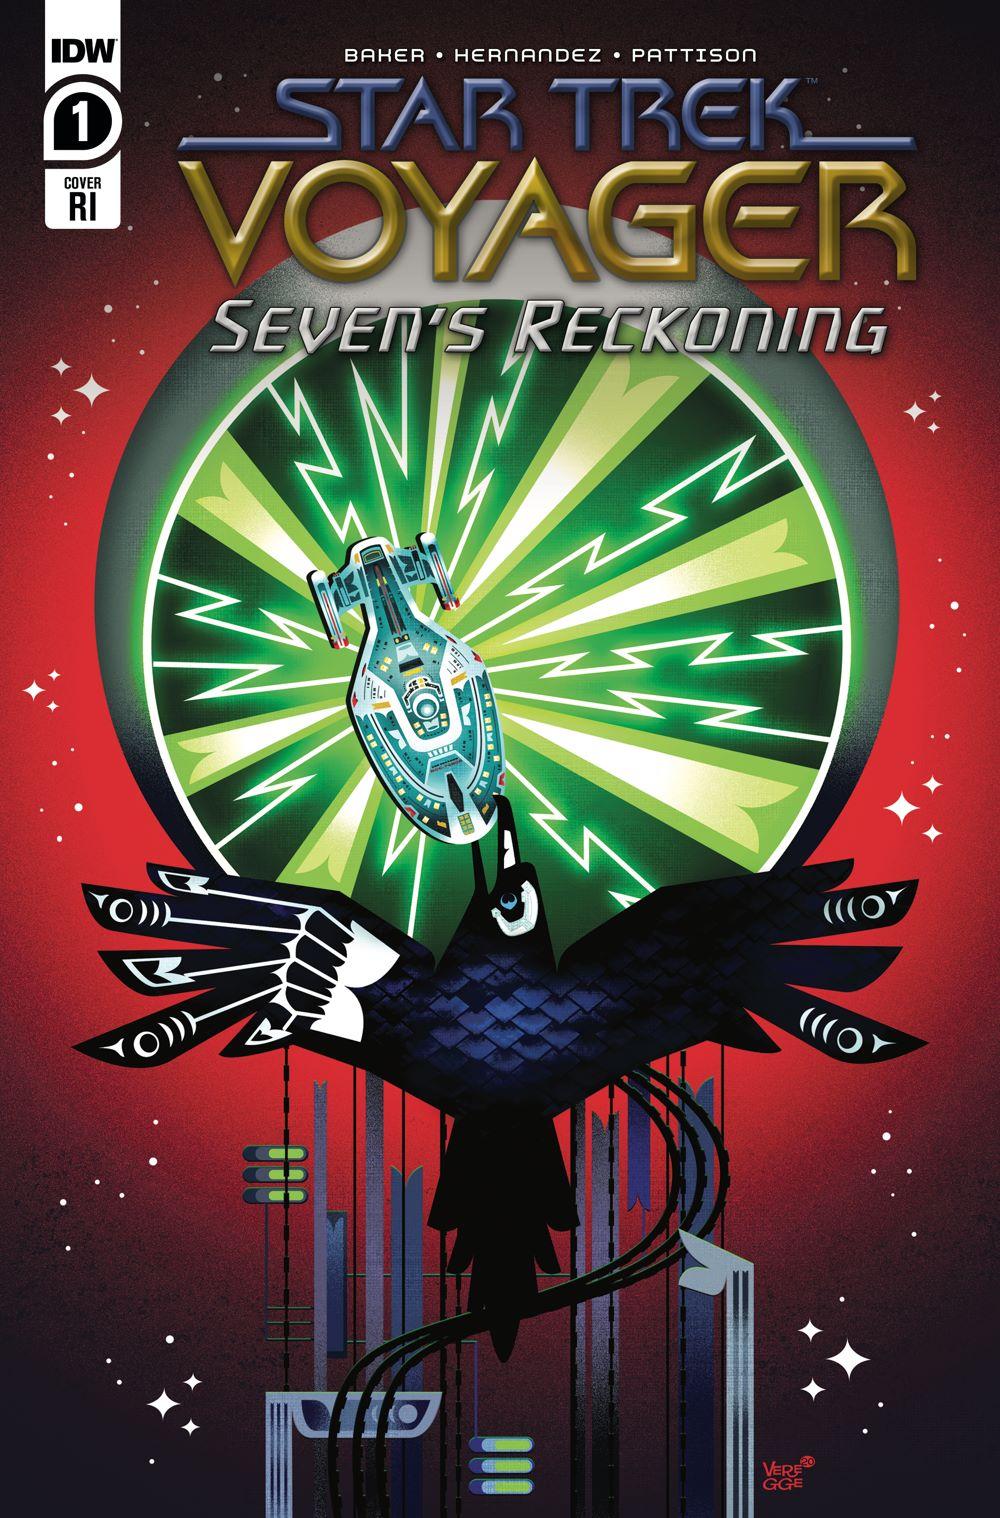 ST_Voyager_SR01-coverRI ComicList Previews: STAR TREK VOYAGER SEVEN'S RECKONING #1 (OF 4)